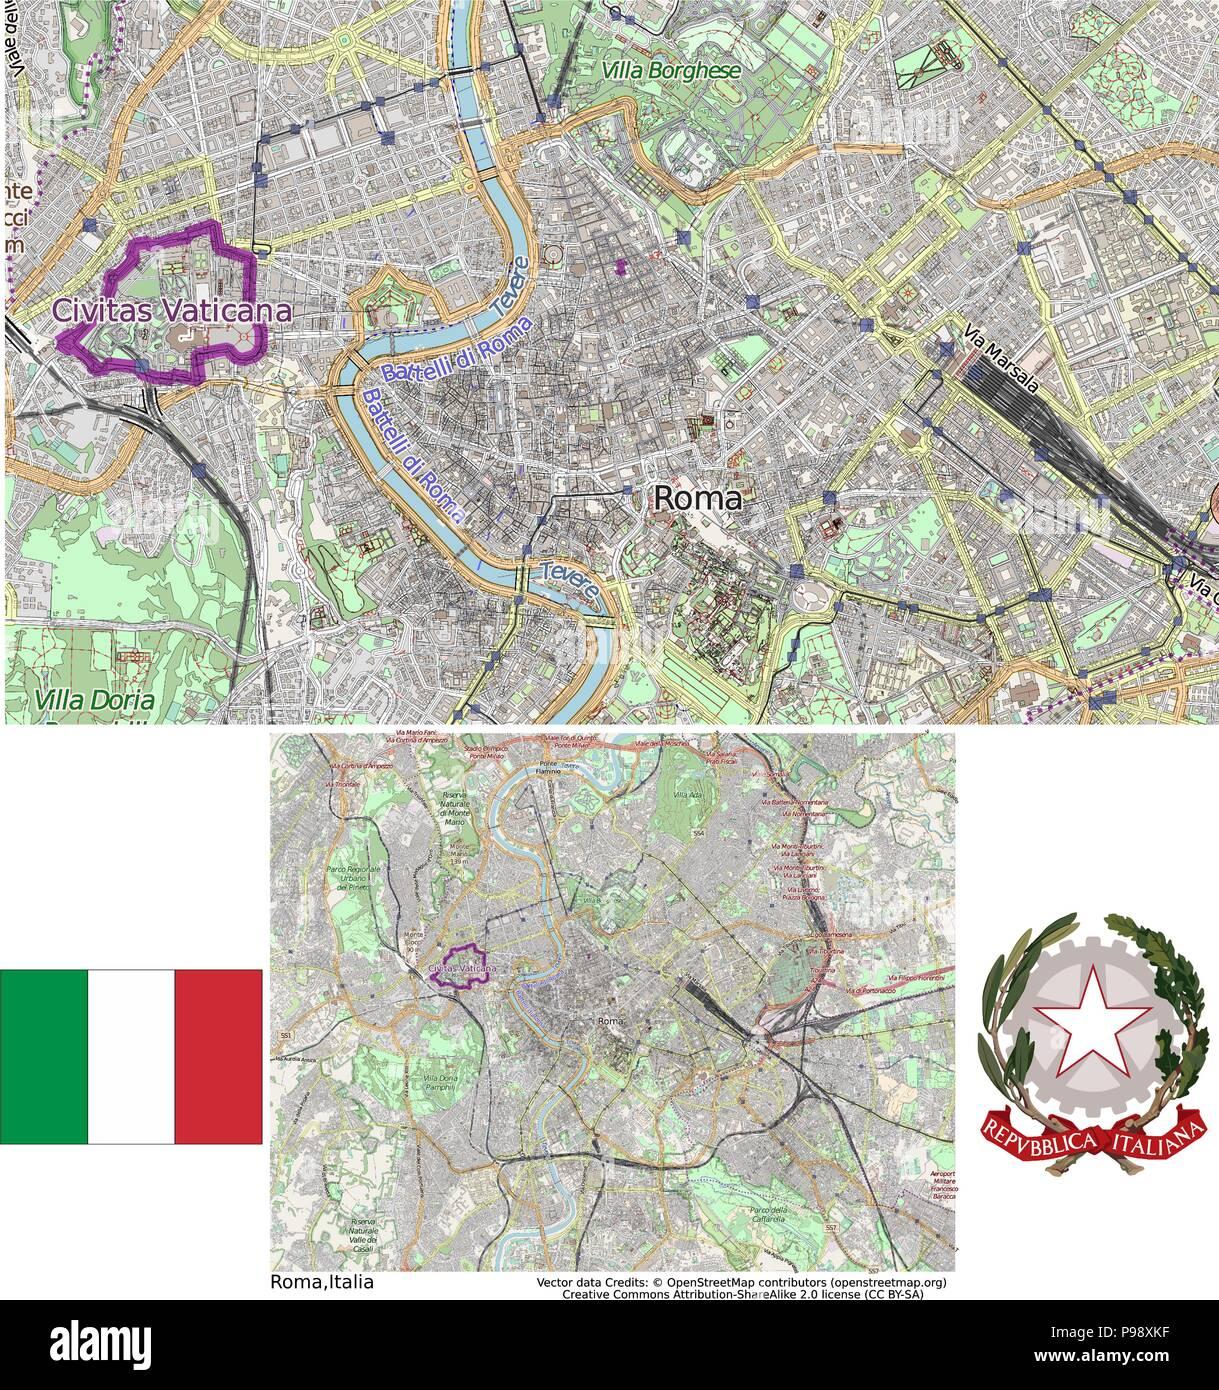 Italy Rome Vatican City - Stock Vector